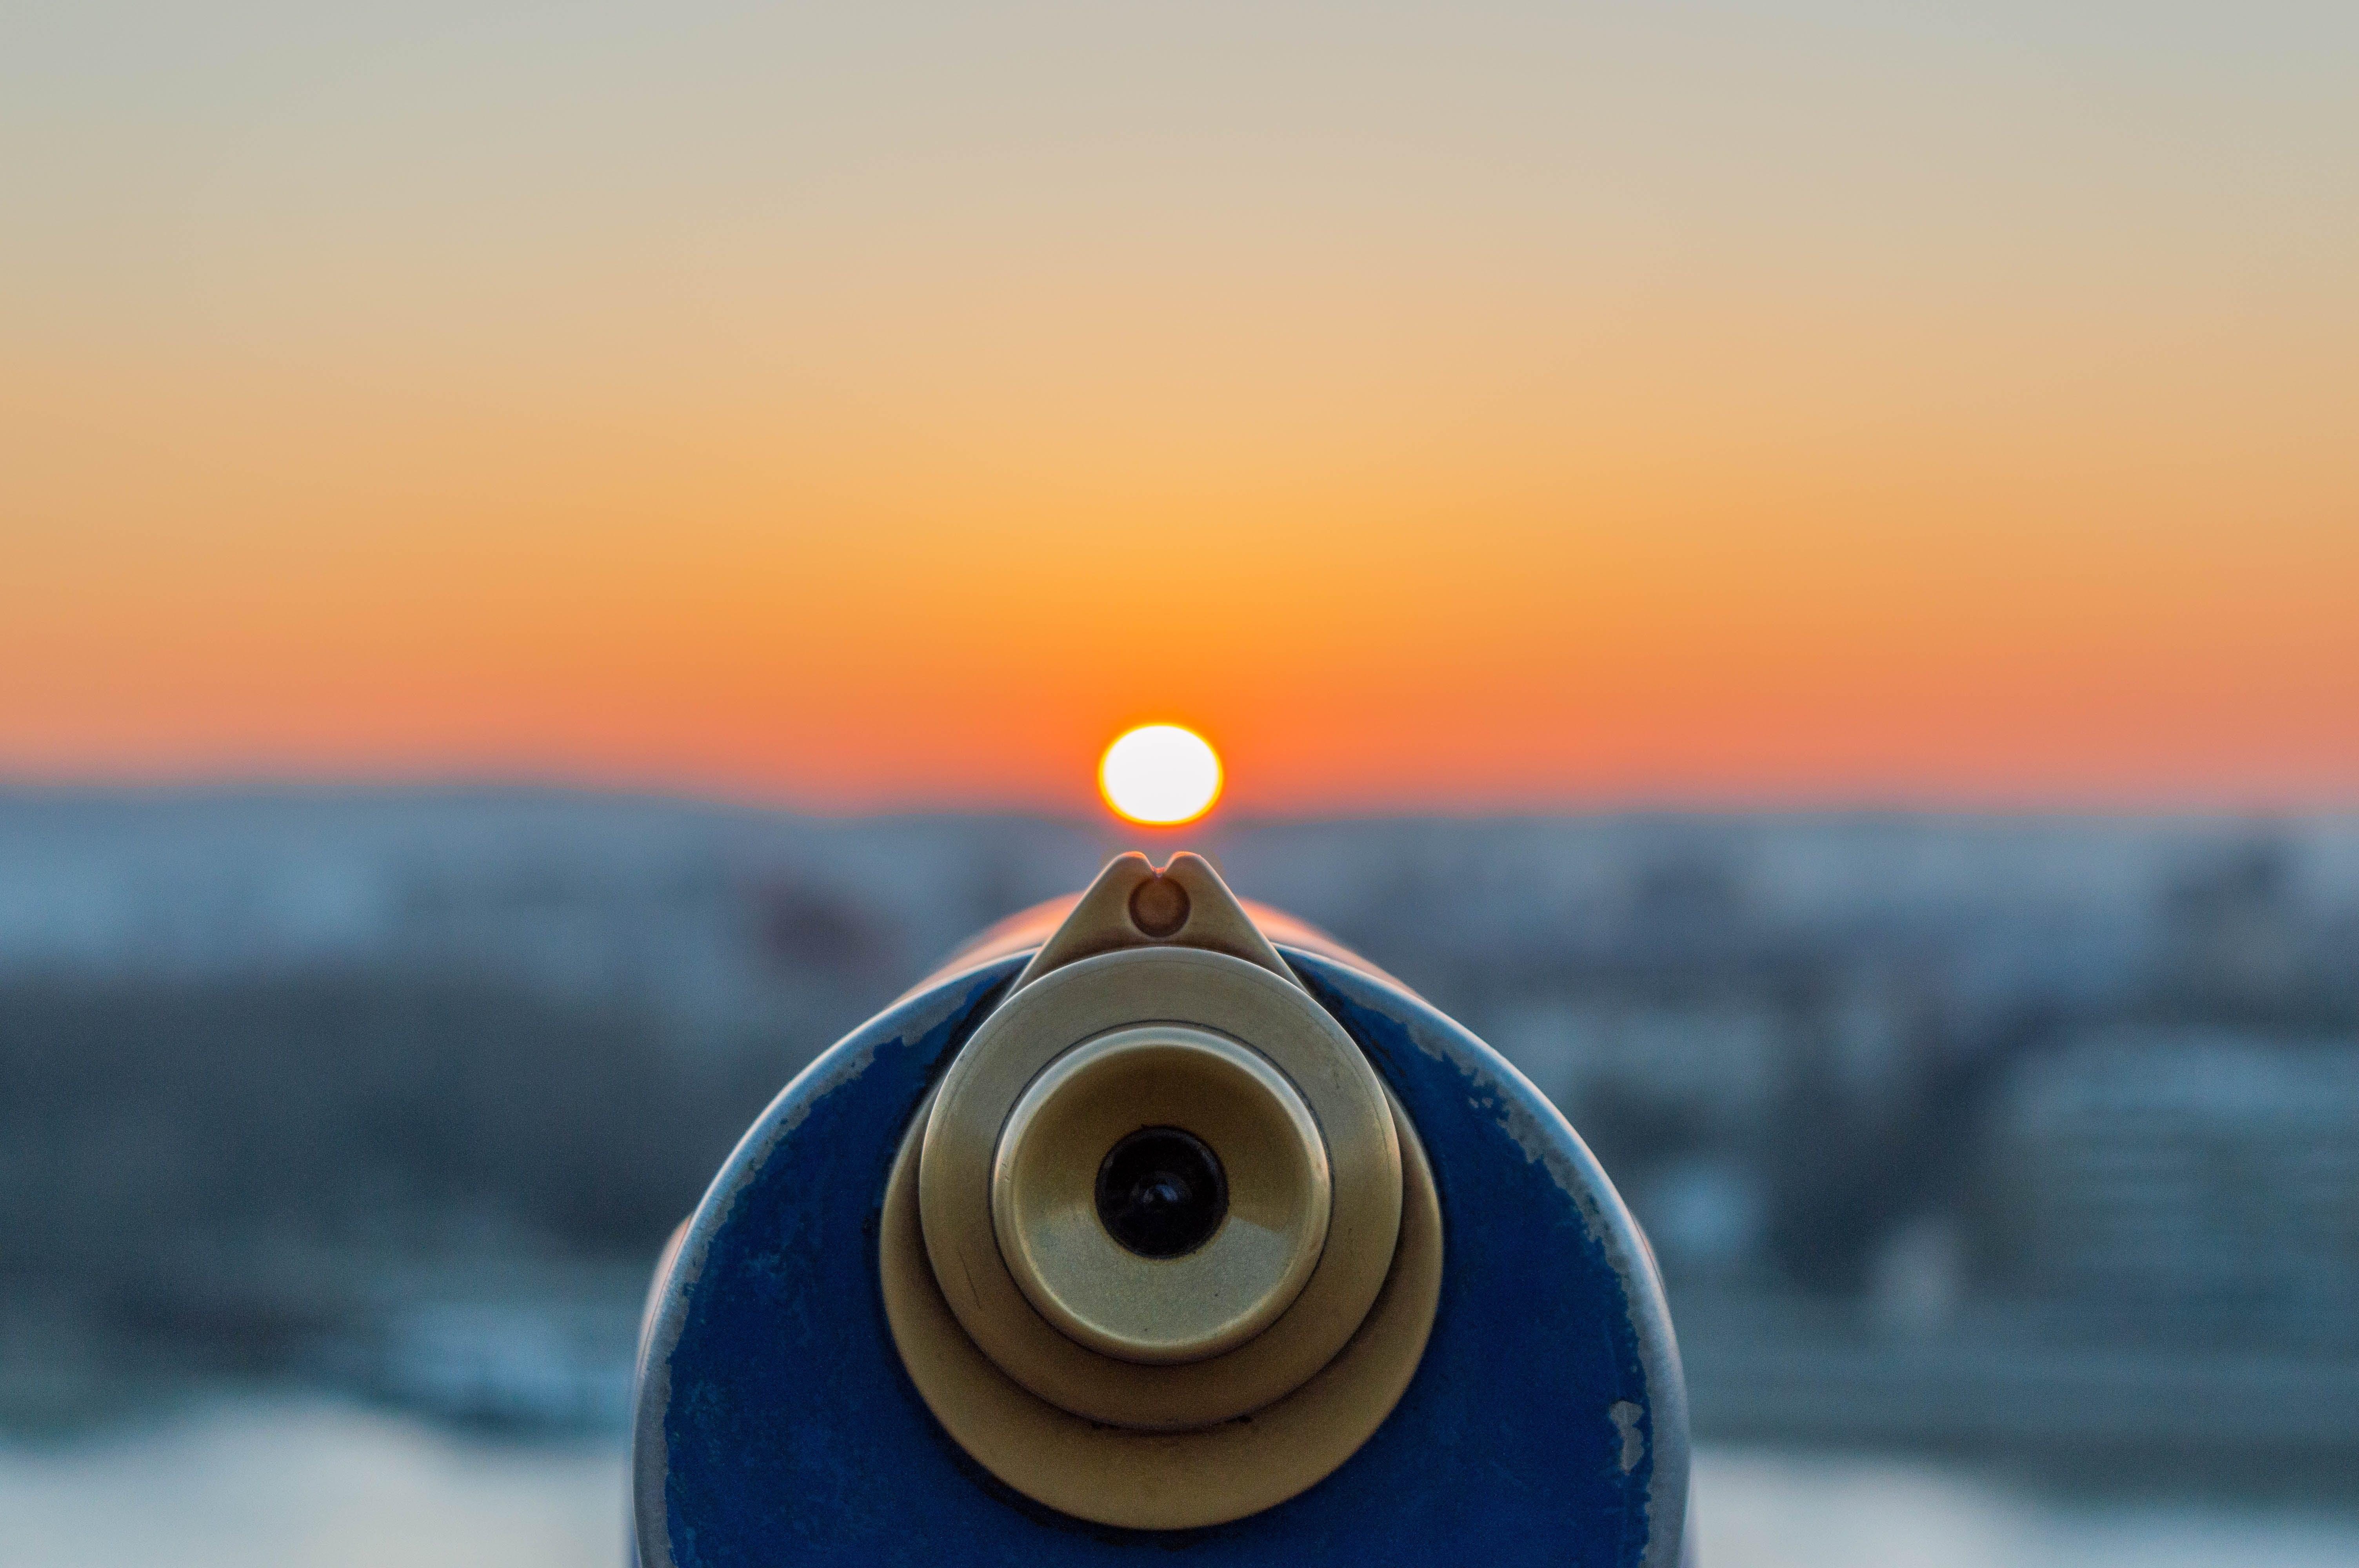 Blue Deck Telescope